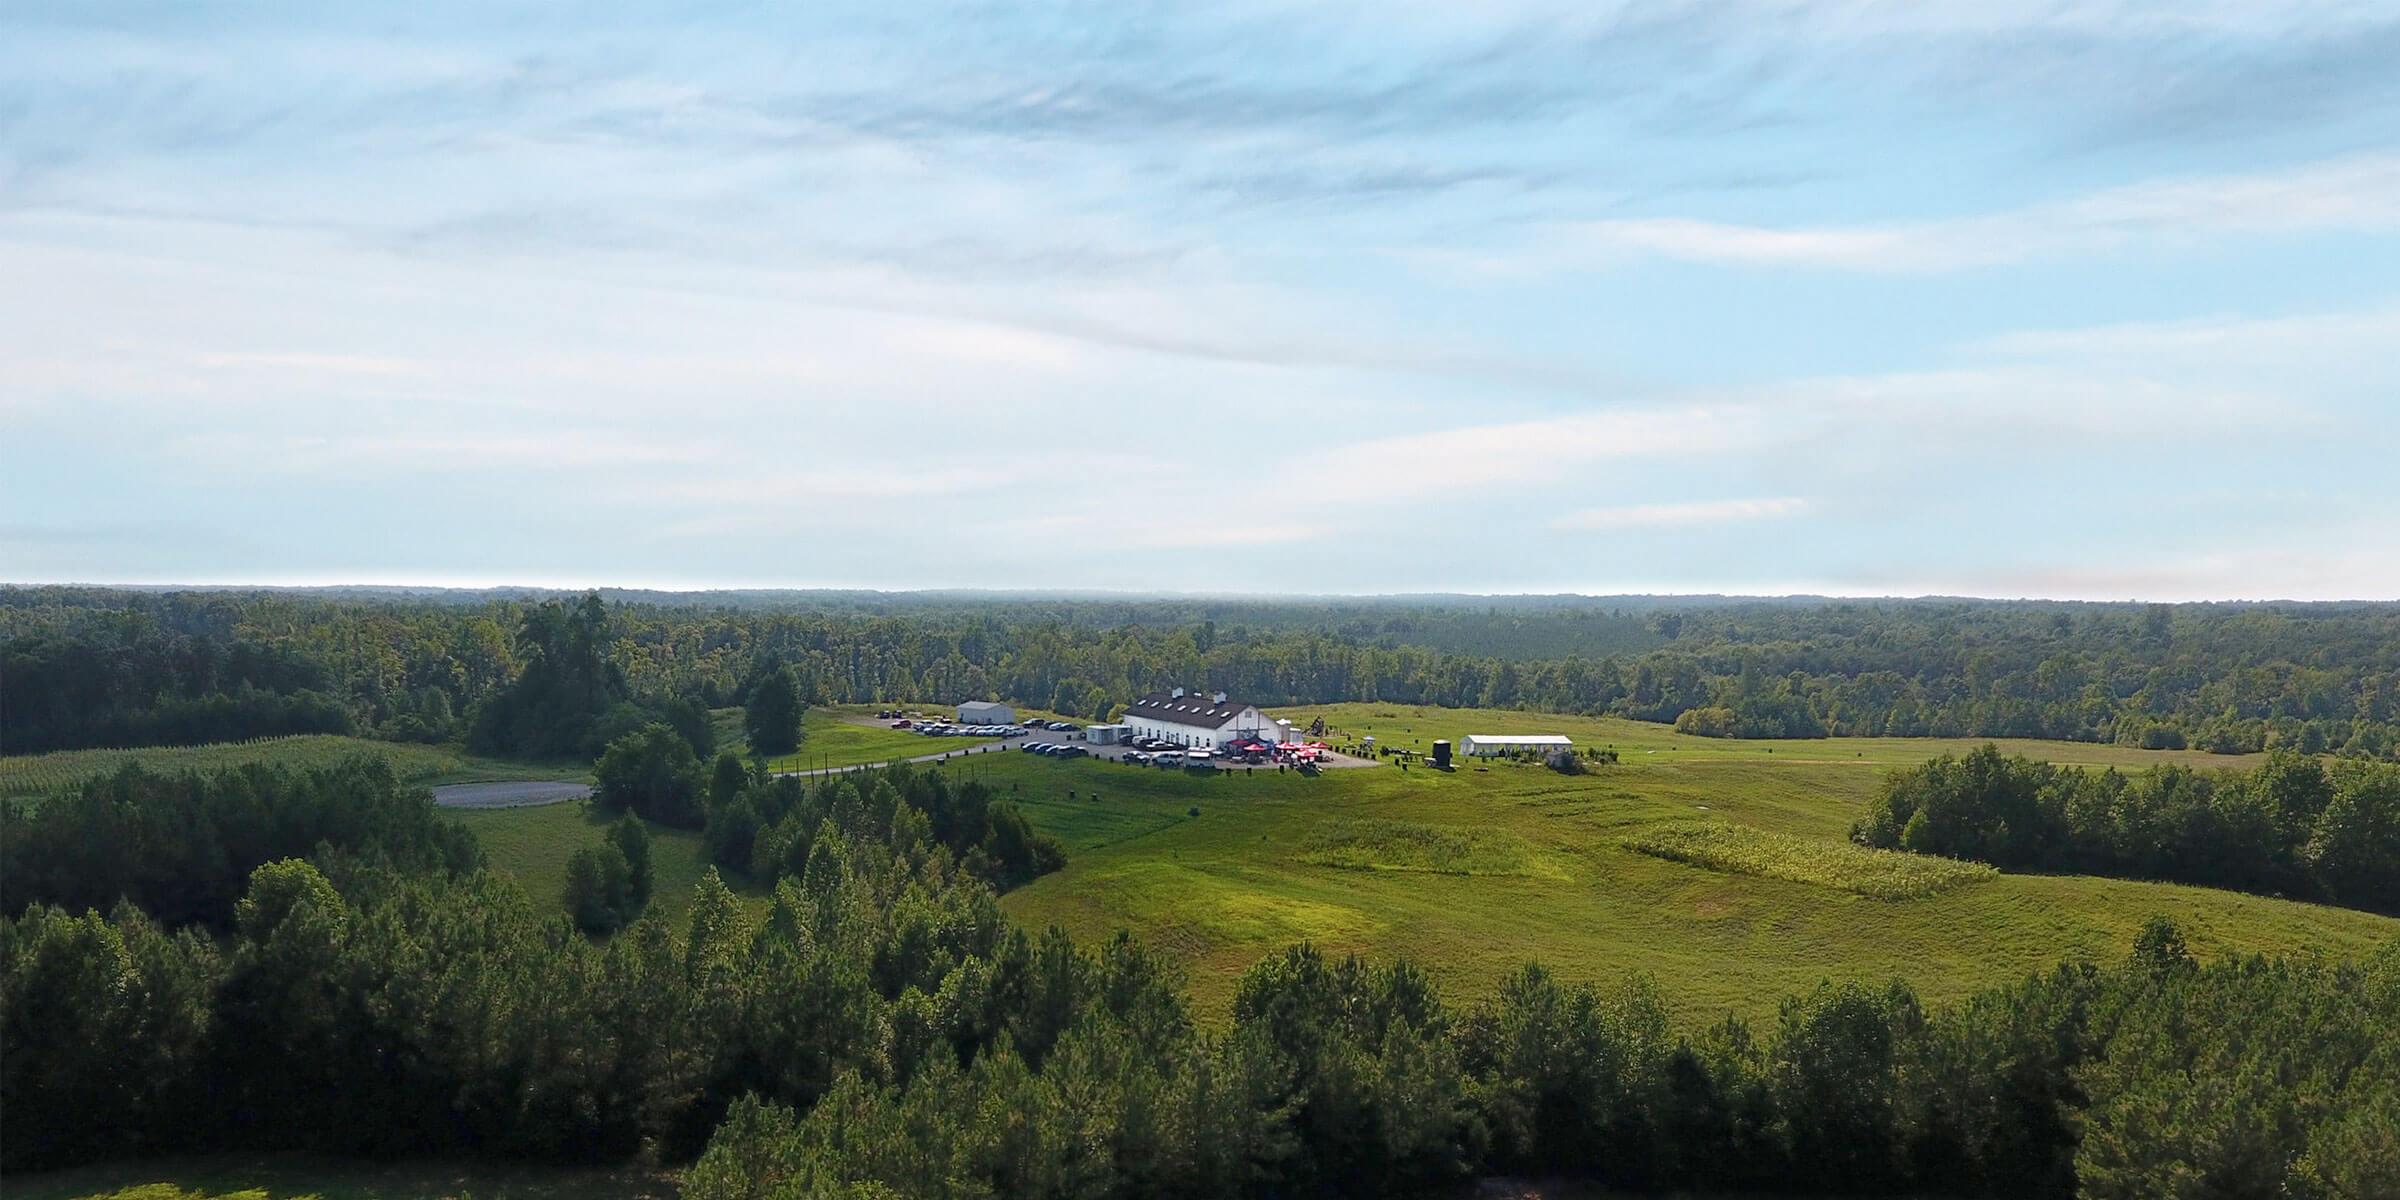 The farmland surrounding Lickinghole Creek Craft Brewery in Goochland, Virginia